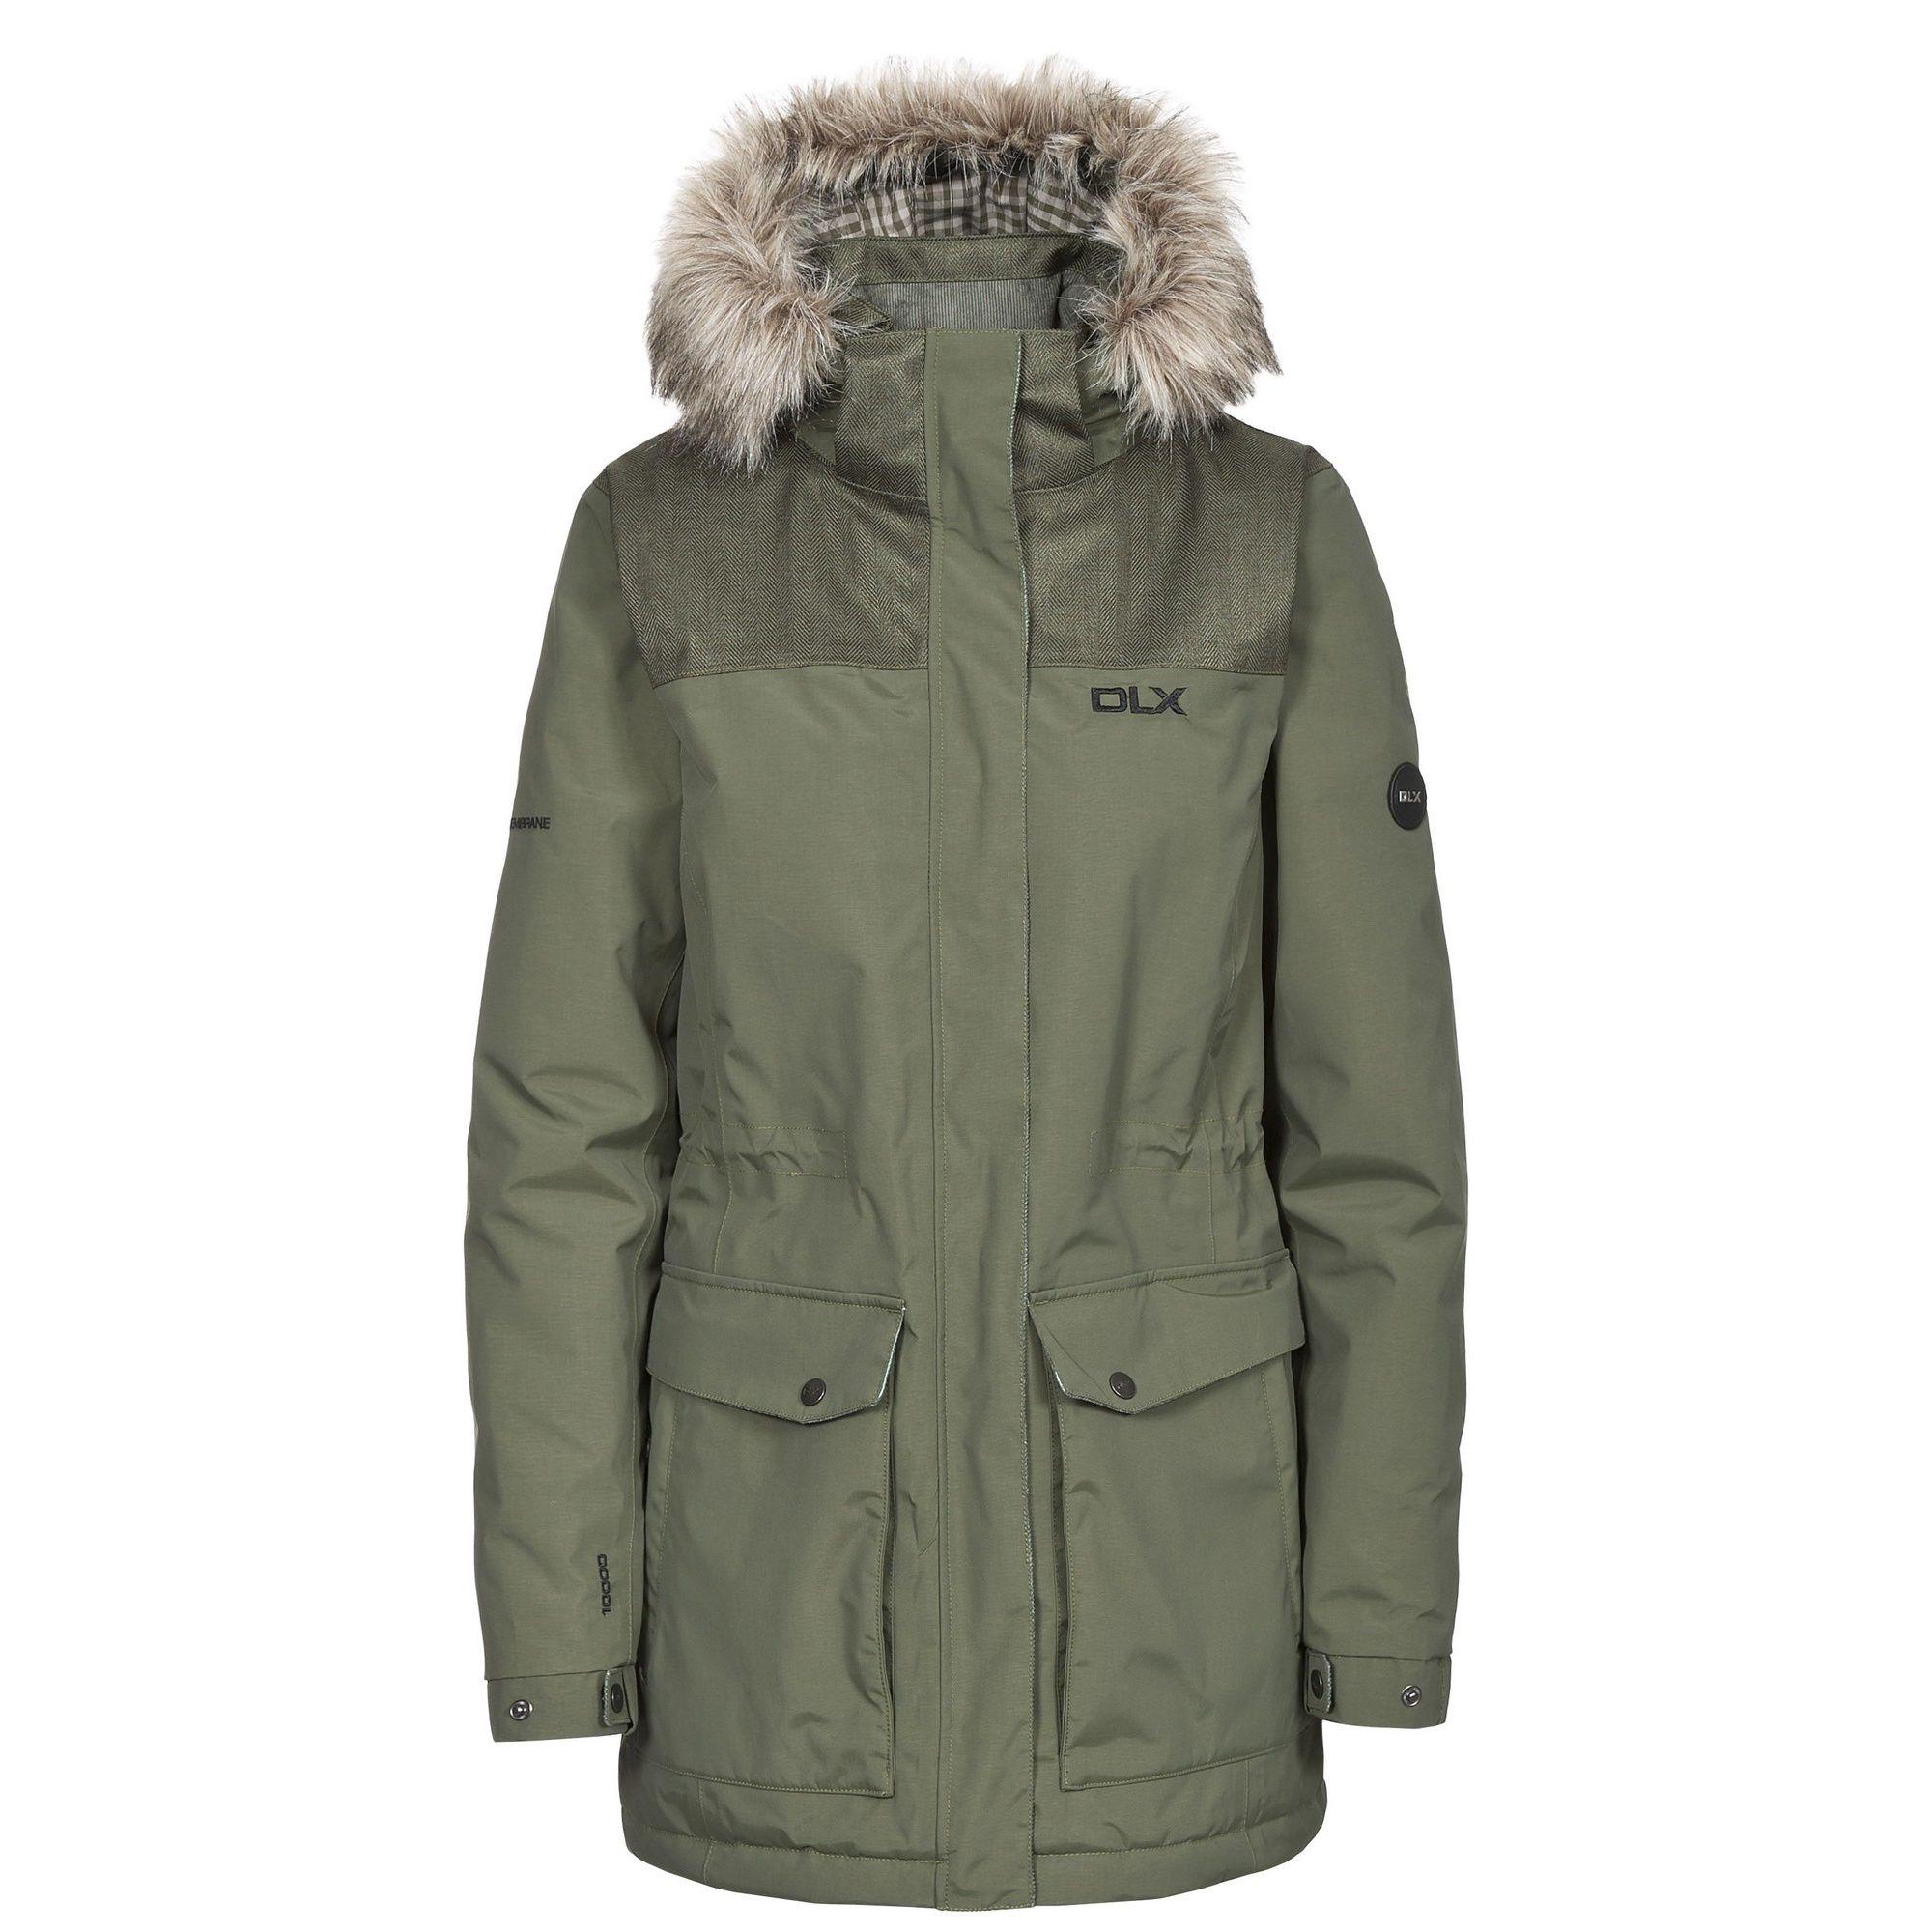 Trespass Women's Garner Waterproof DLX Parka Jacket